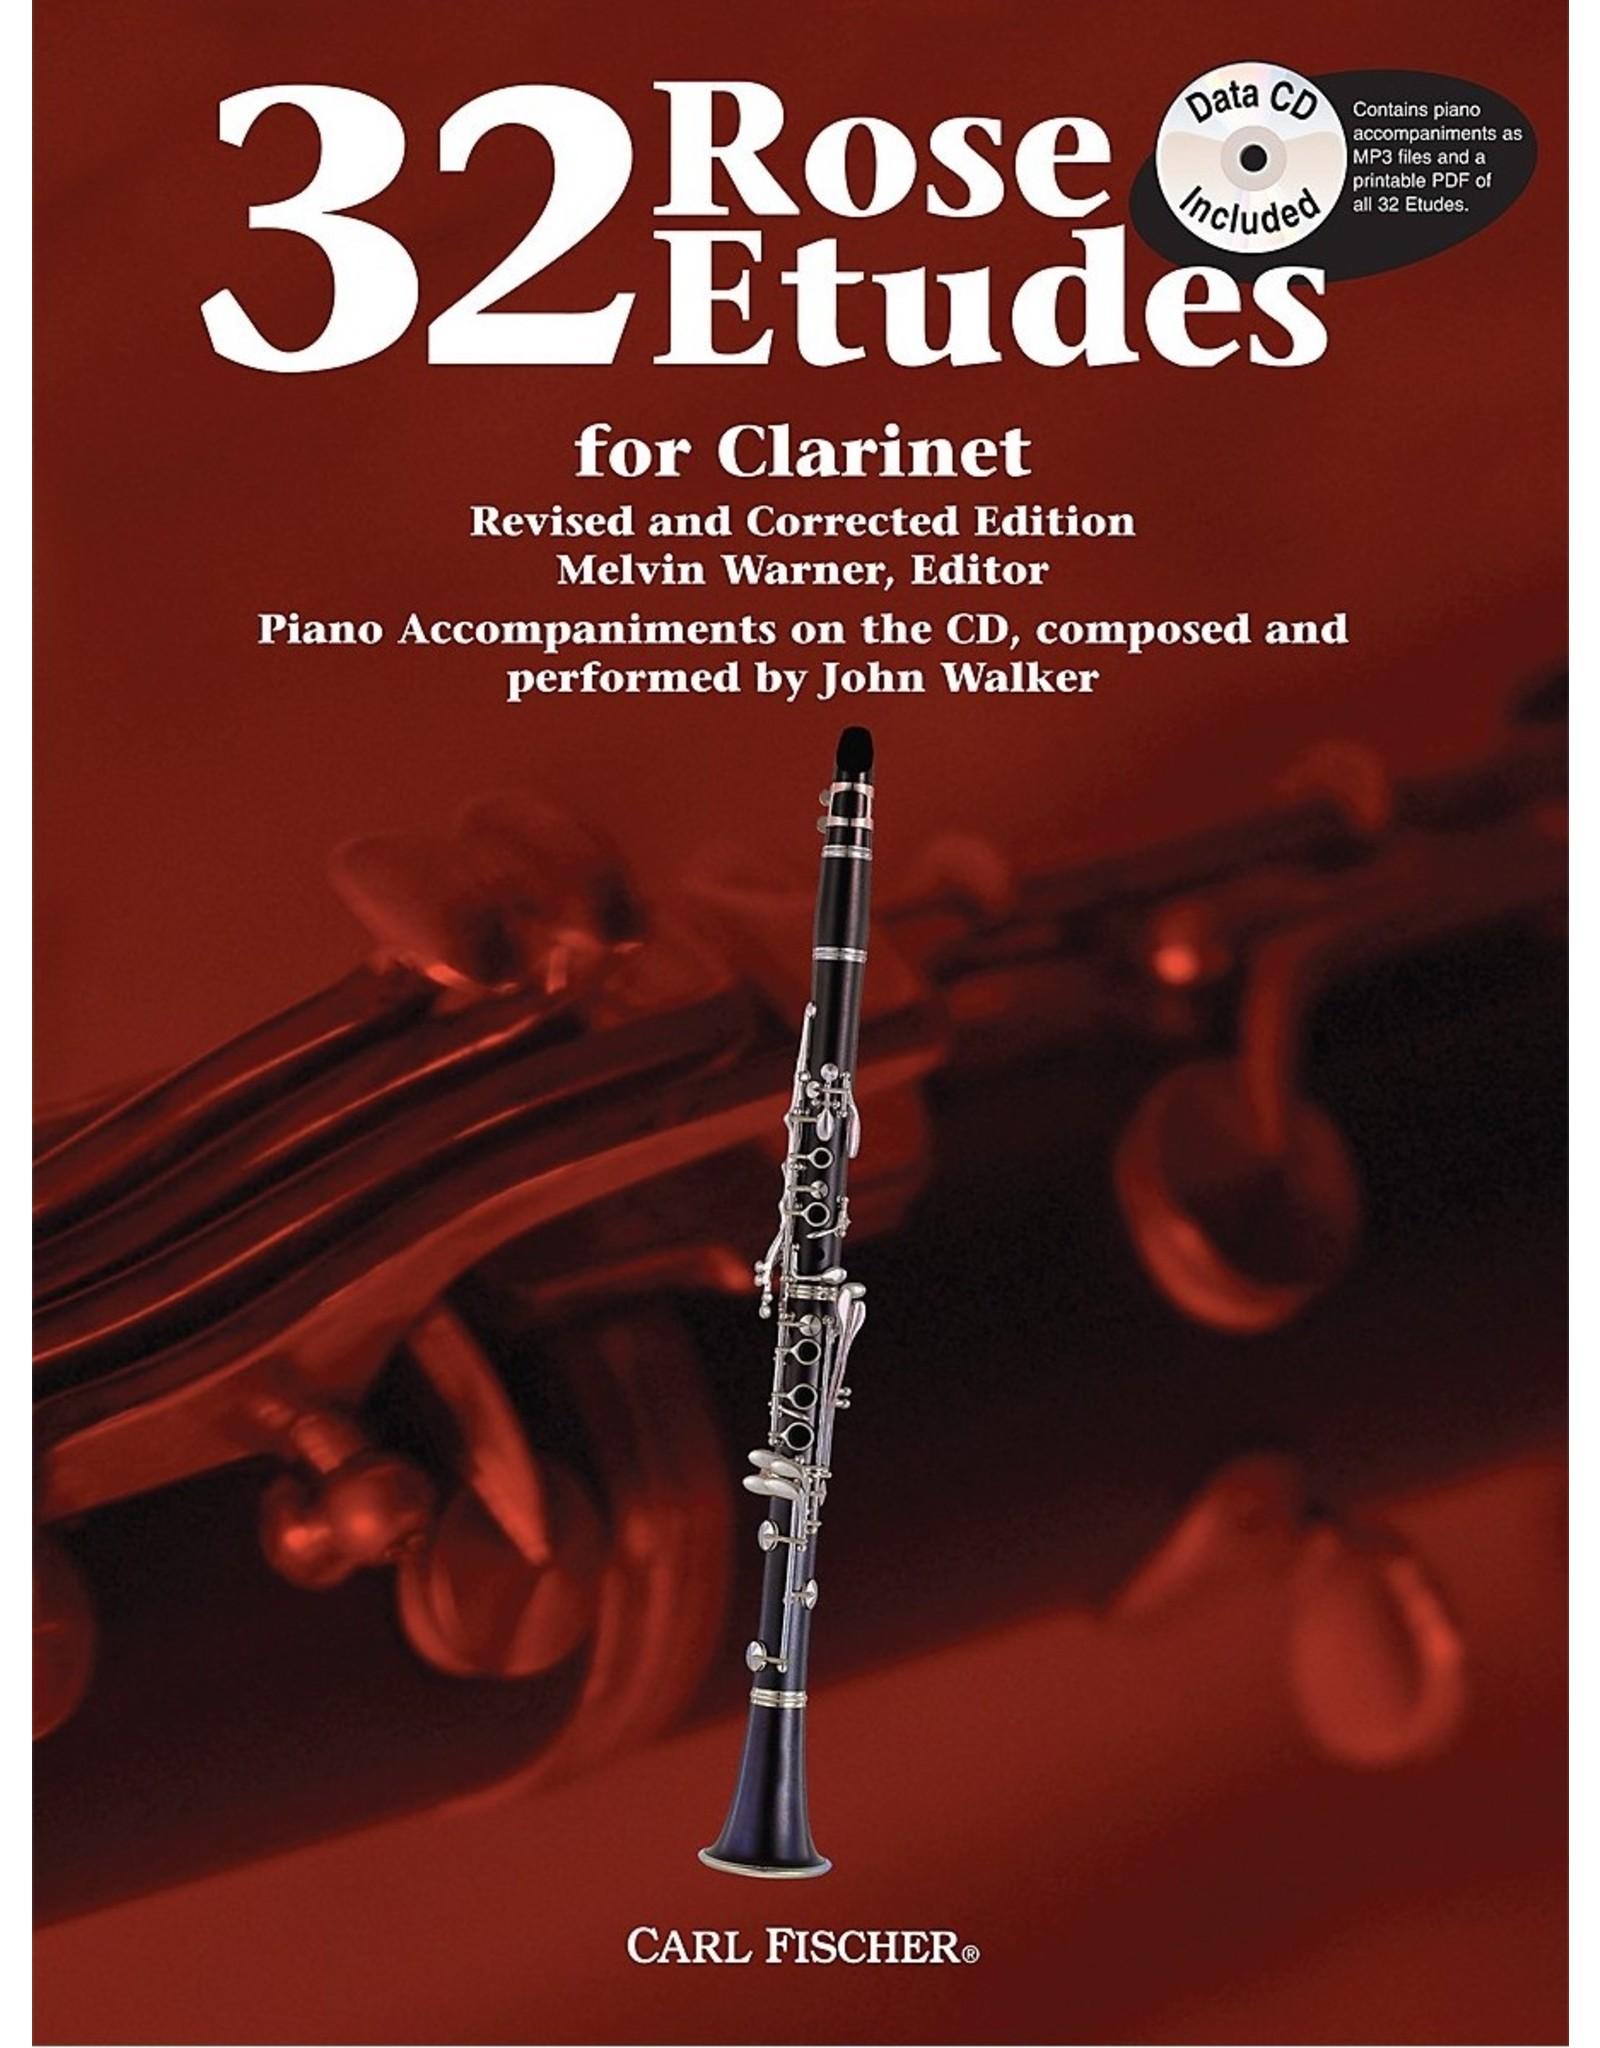 Carl Fischer LLC Rose 32 Etudes For Clarinet clarinet, clarinet and piano - John Walker, Franz Wilhelm Ferling Cyrille Rose Melvin Warner